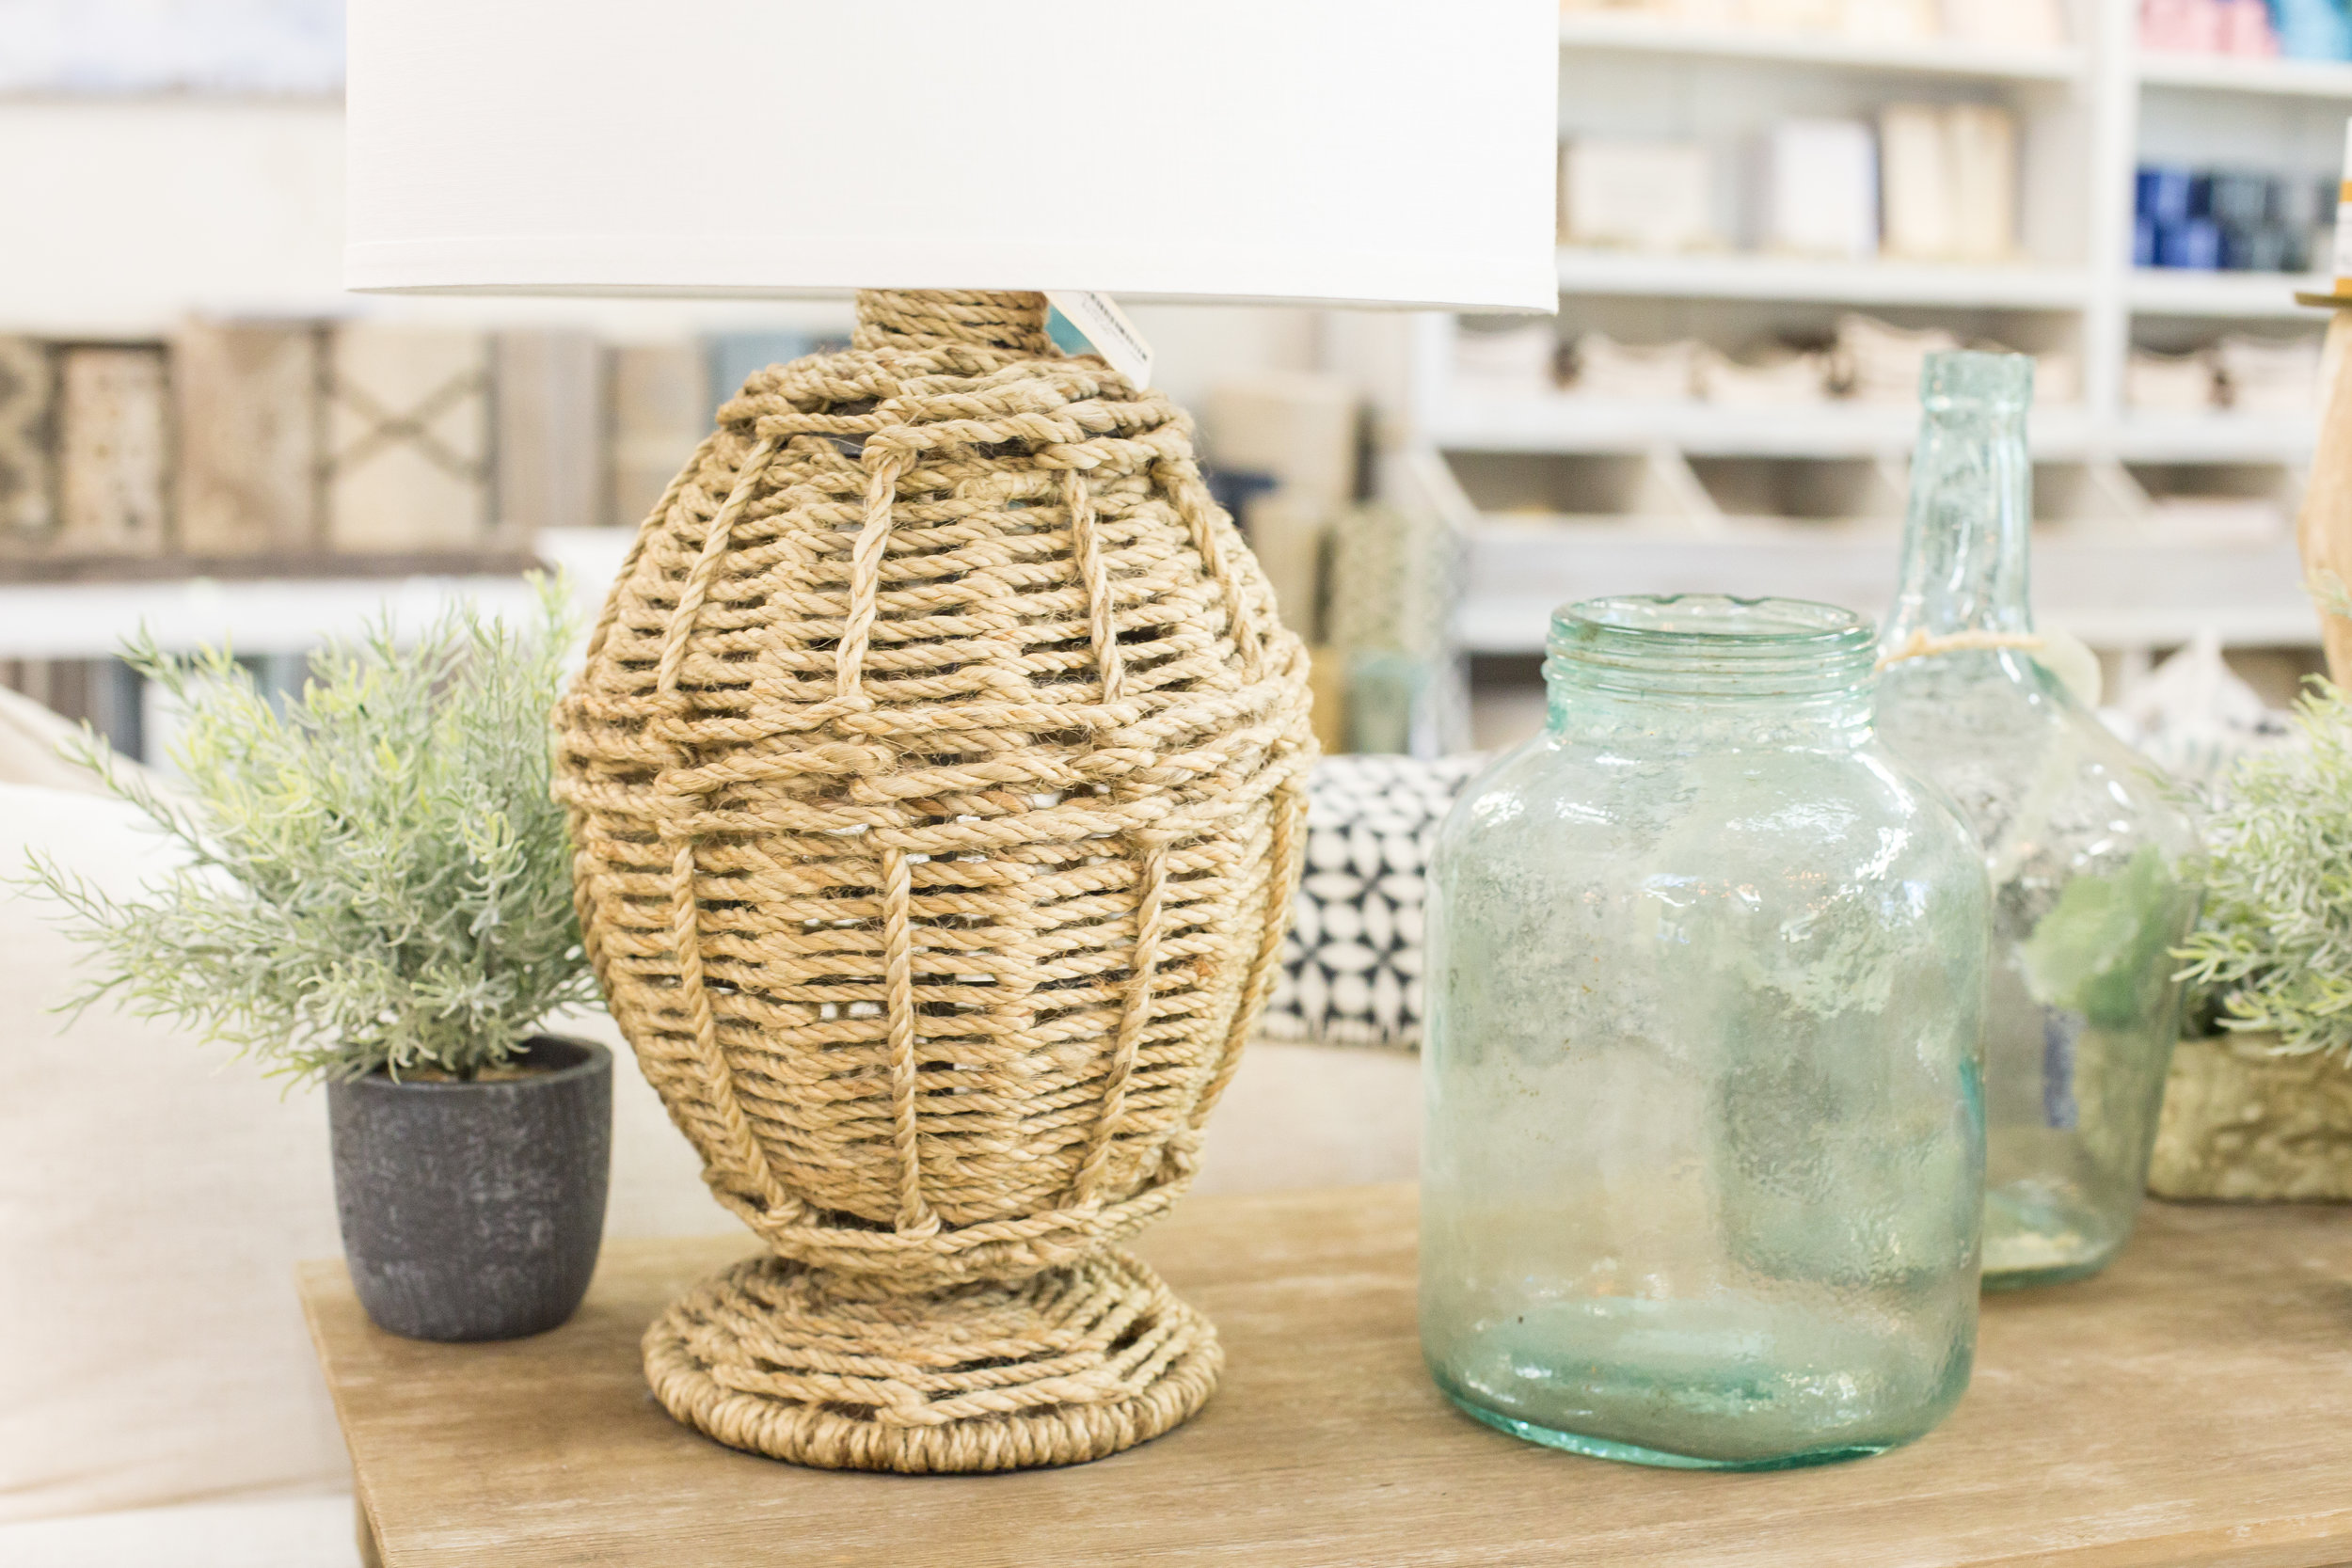 Seaglass jars, woven lamp